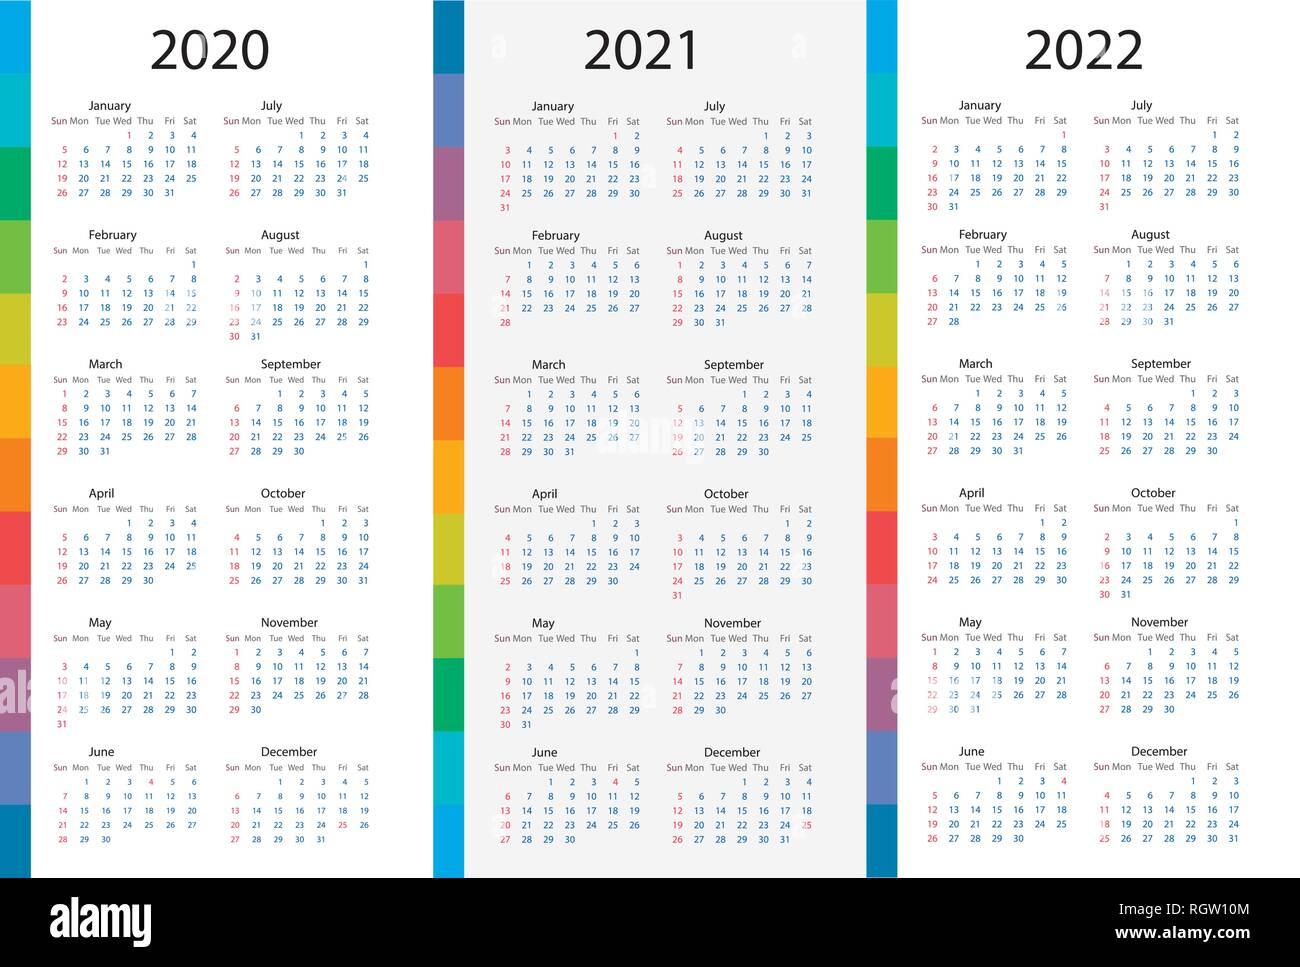 Calendrier 2020 Semaine.Modele De Calendrier Fixe Pour 2020 2021 2022 Ans Semaine